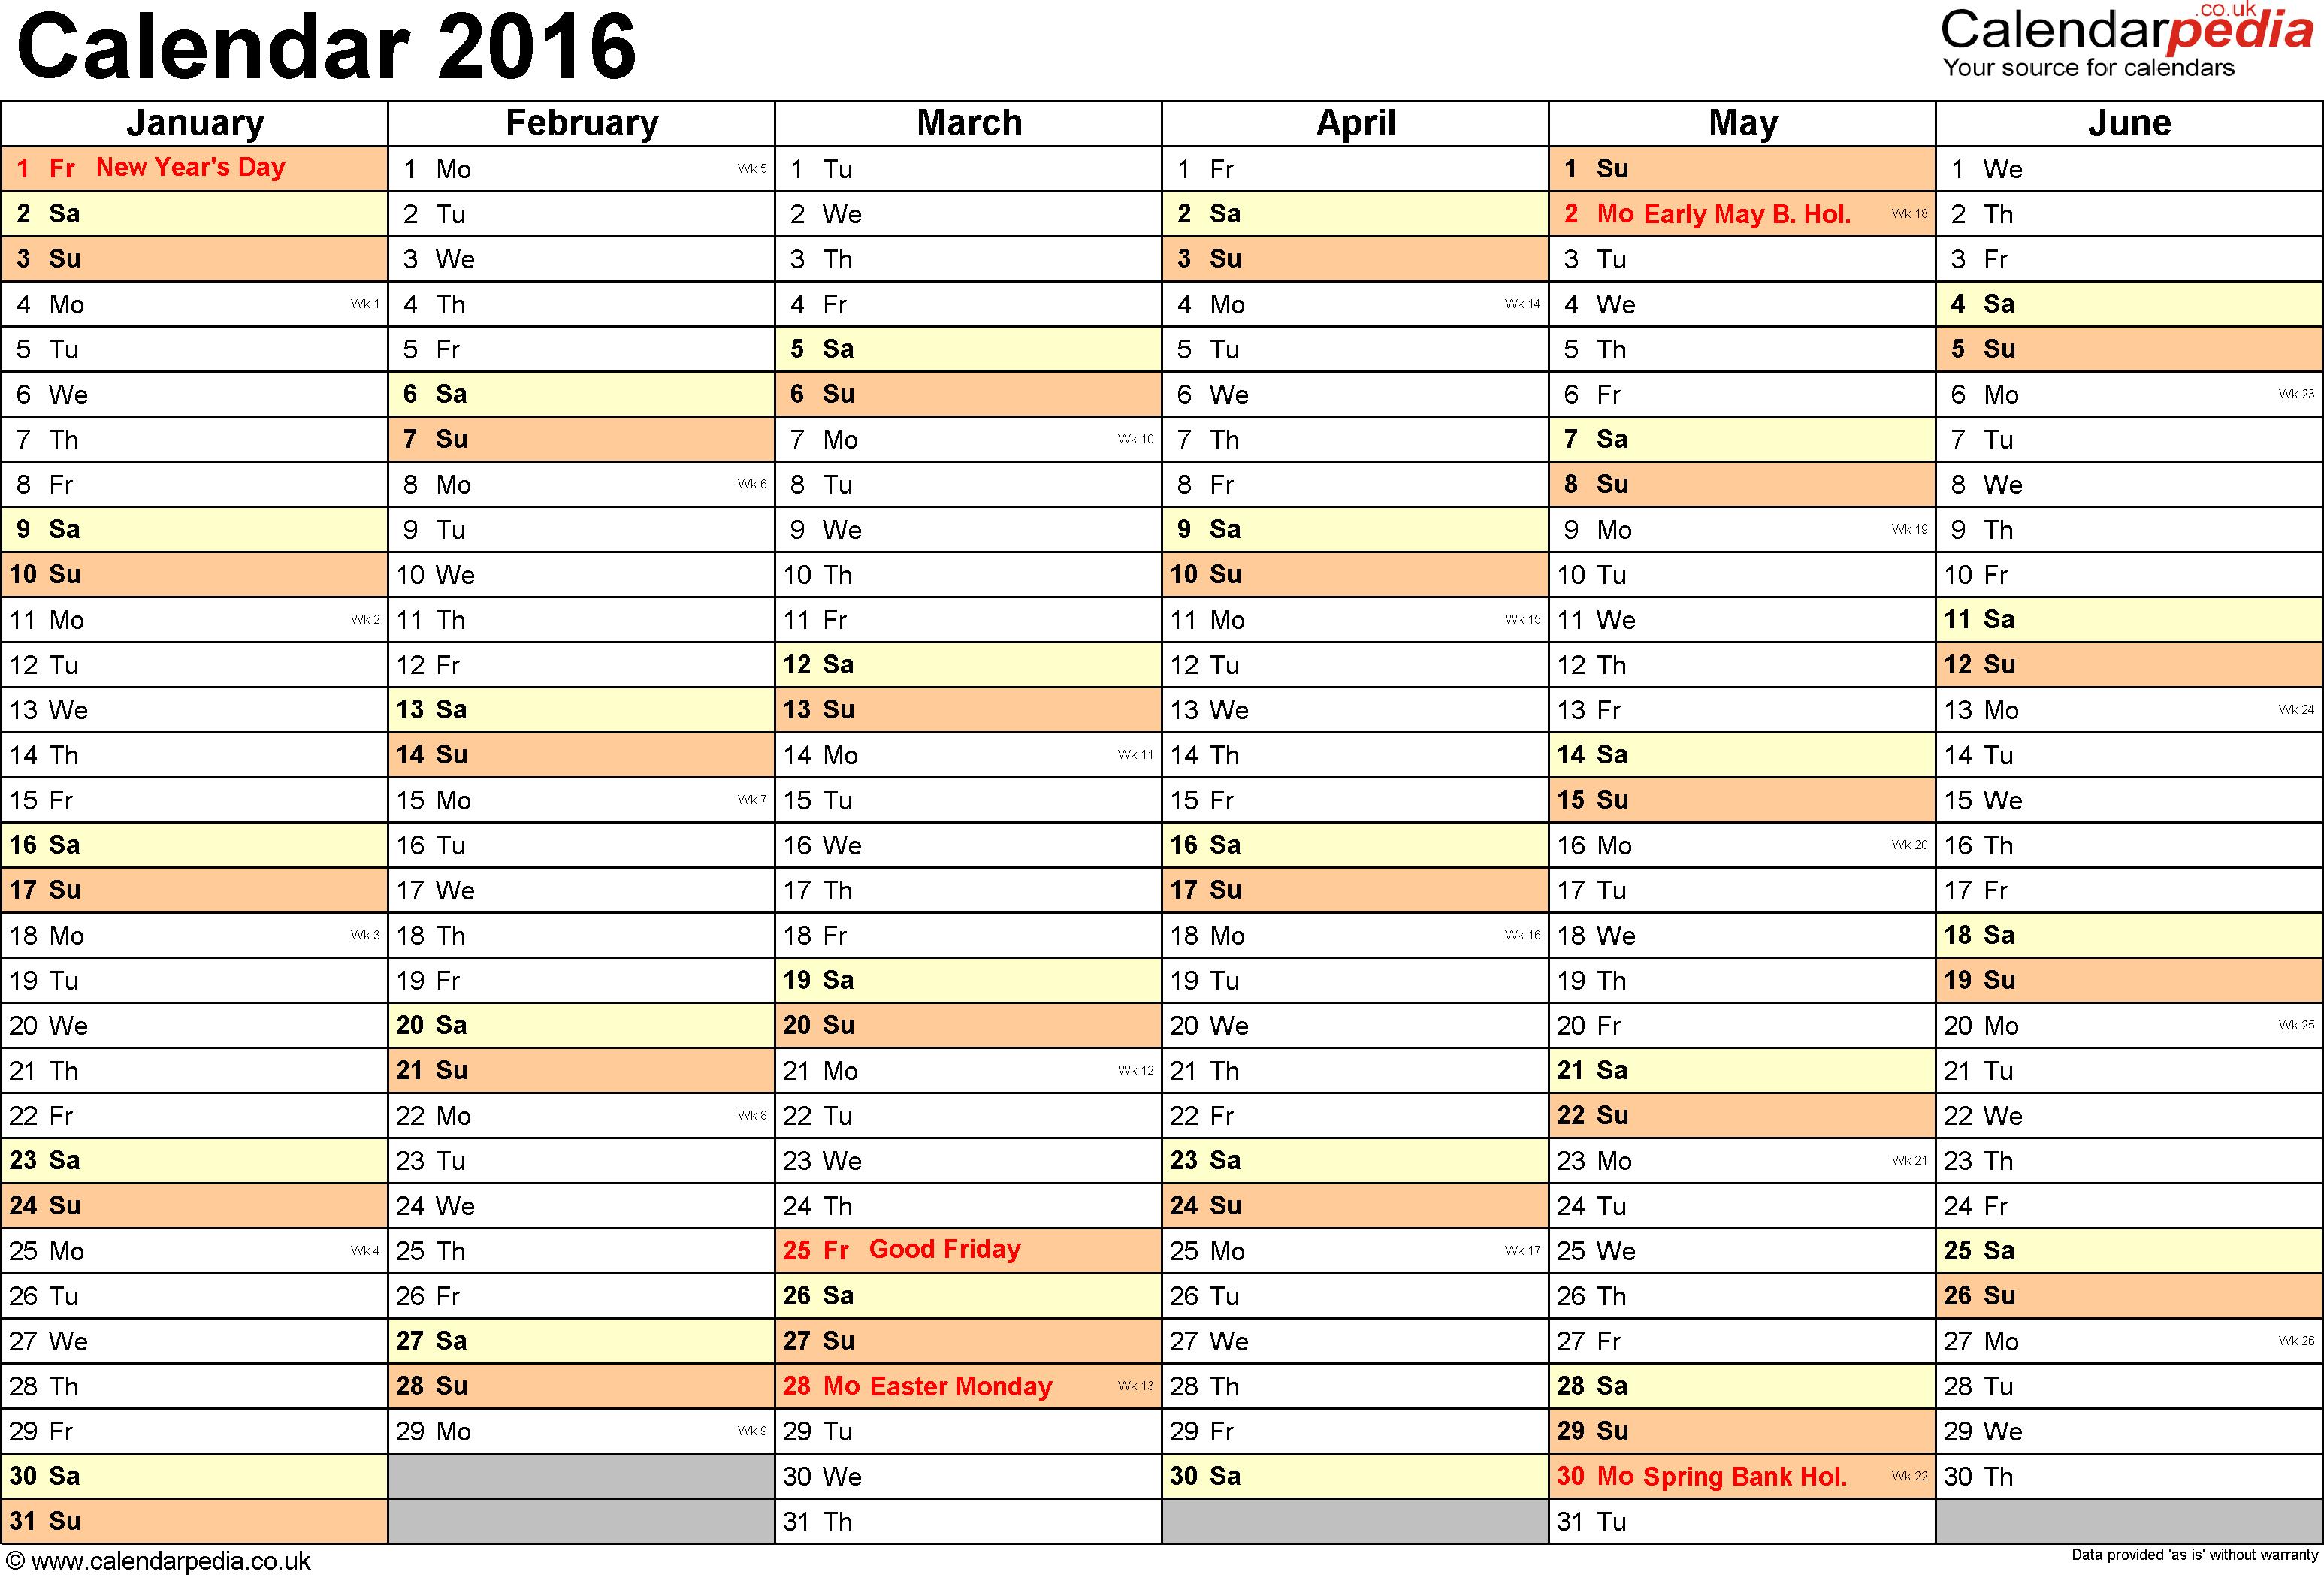 Calendar Spreadsheet 2015 - Wpa.wpart.co